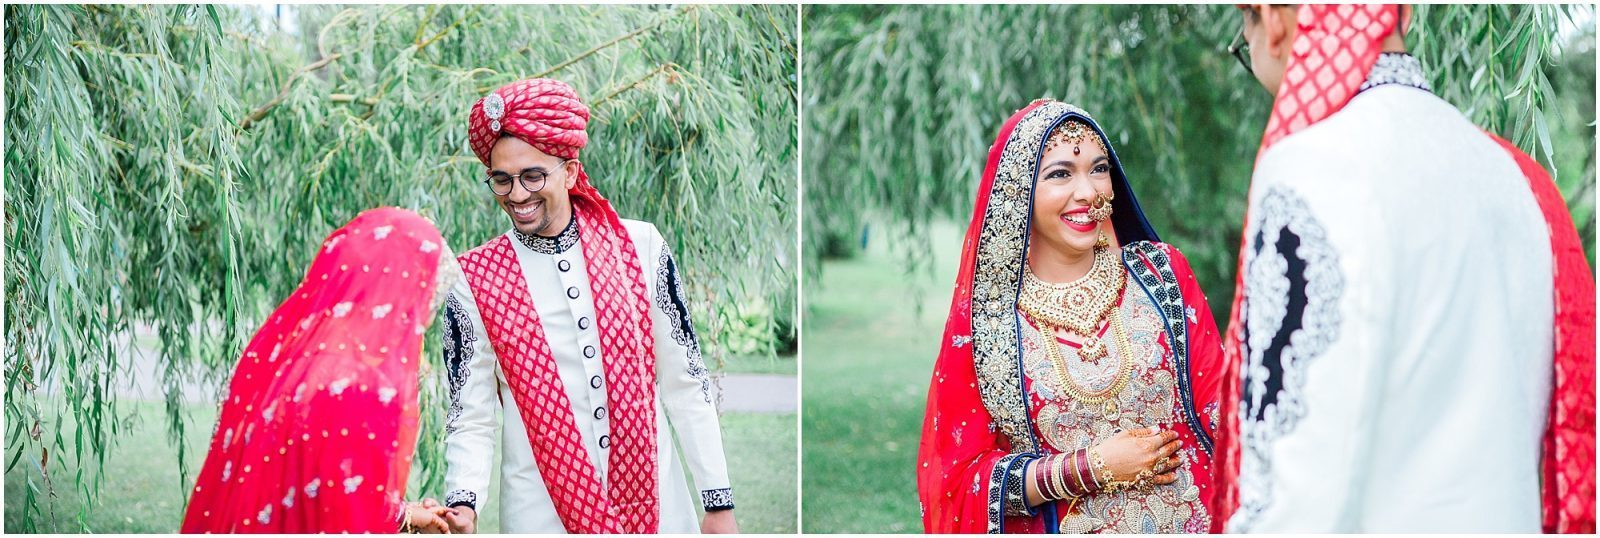 South Asian Wedding Toronto - Mehndi - Nikah, walima, indian wedding, pakistani wedding. Sarah & Sajid - first look